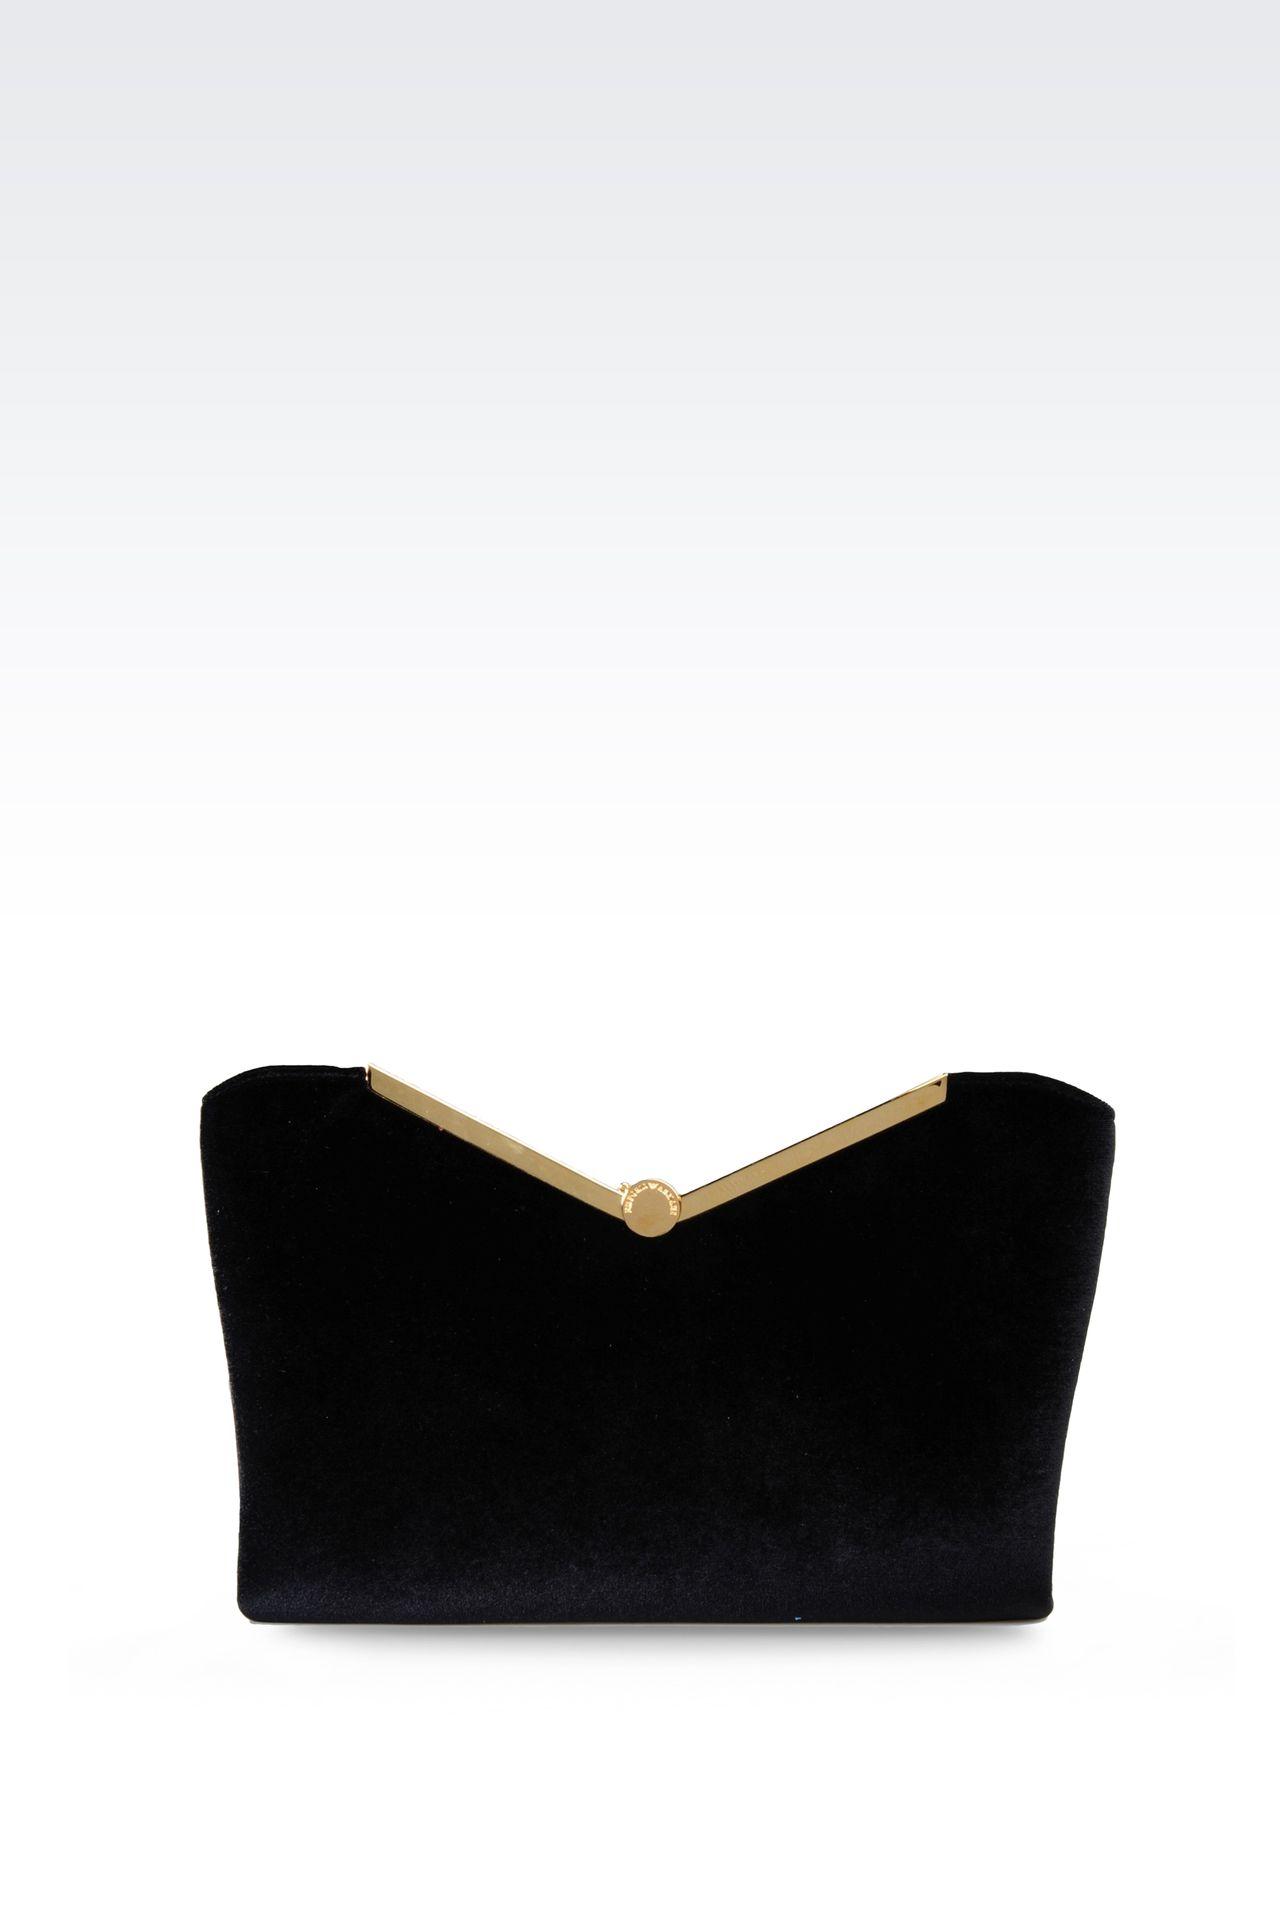 Emporio Armani Women Messenger Bag - VELVET CLUTCH Emporio Armani Official Online Store